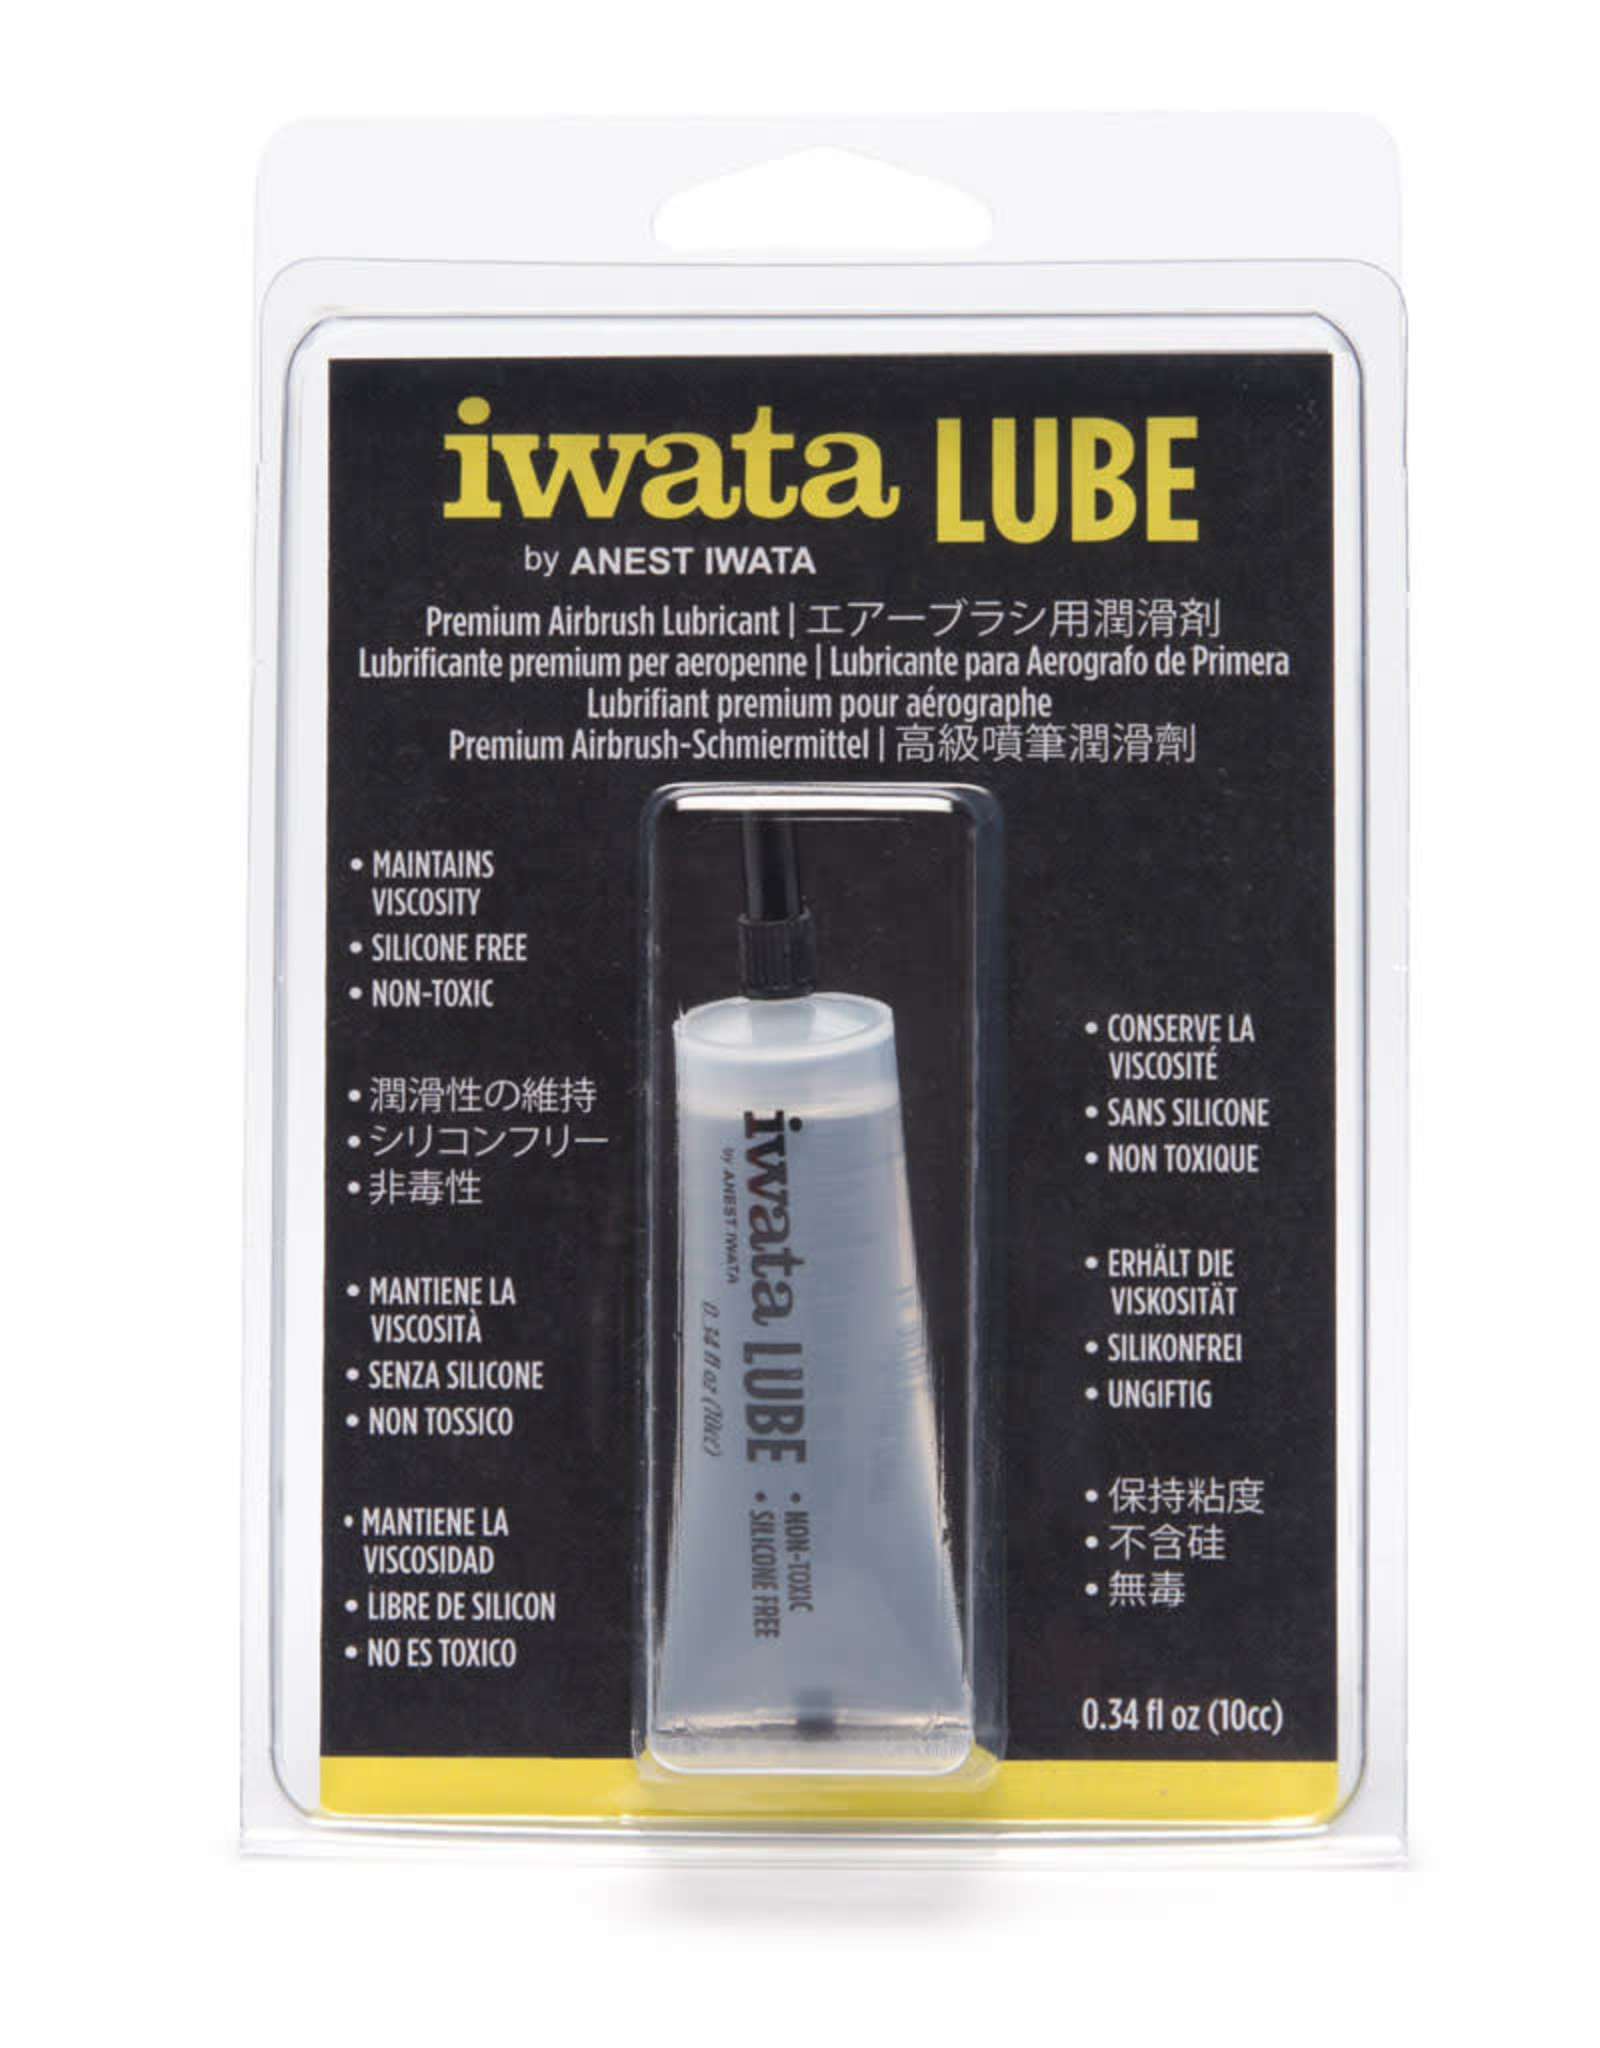 Iwata Iwata Lube Premium Airbrush Lubricant